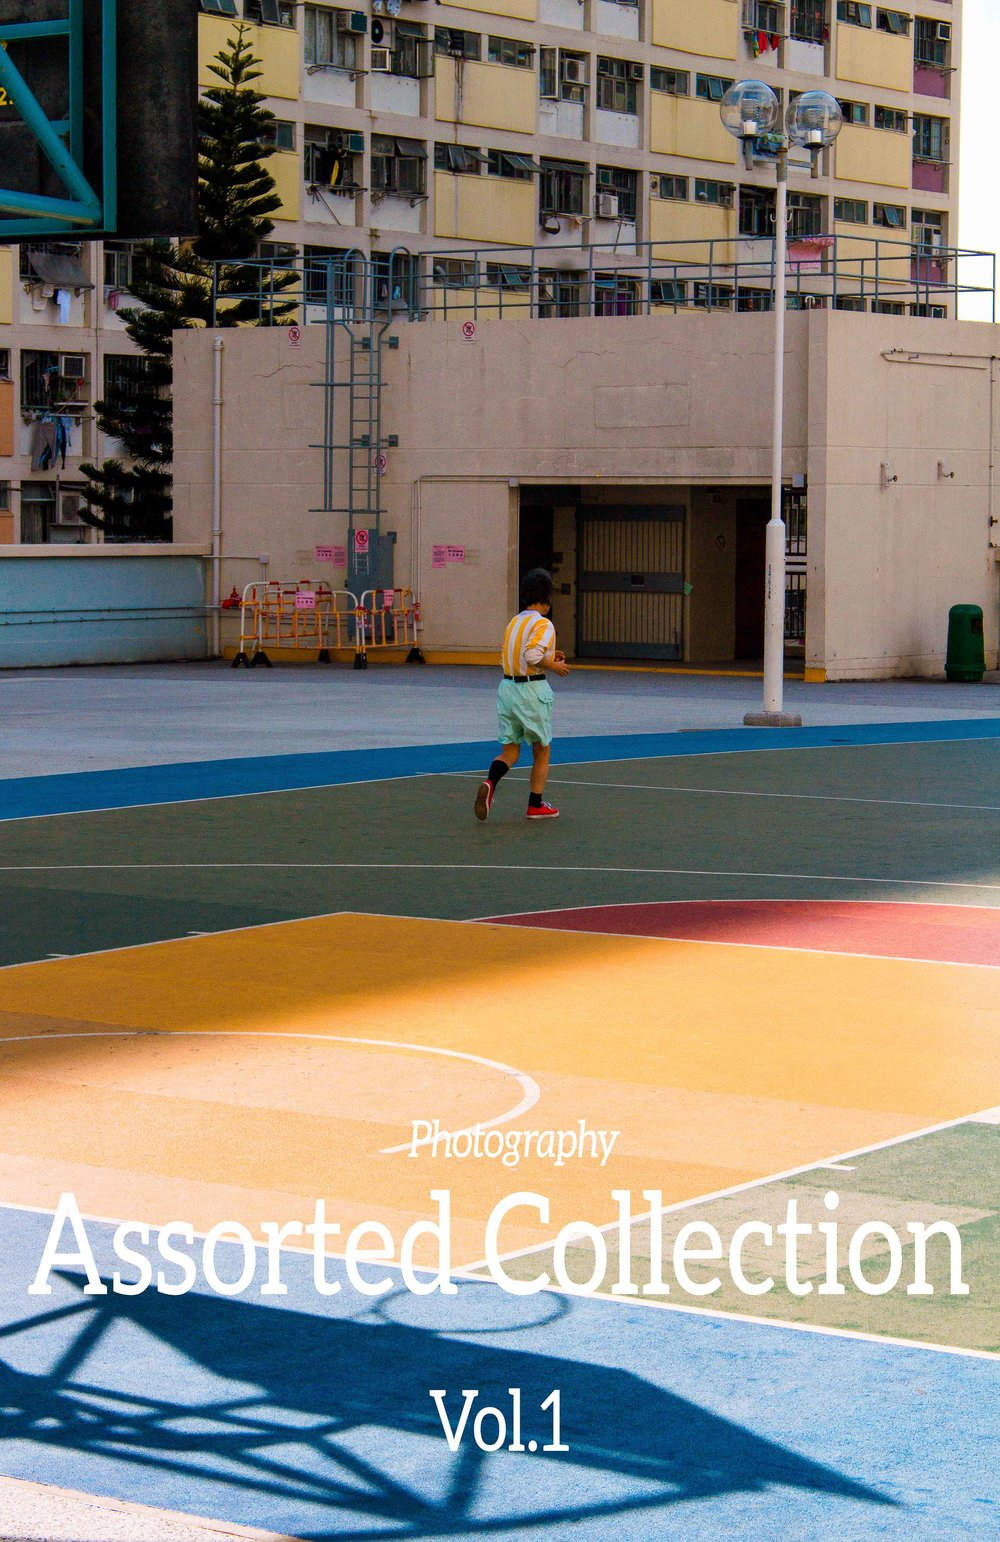 Assorted Collection Vol.1 - Hong Kong, Seoul, Incheon, Hanoi.